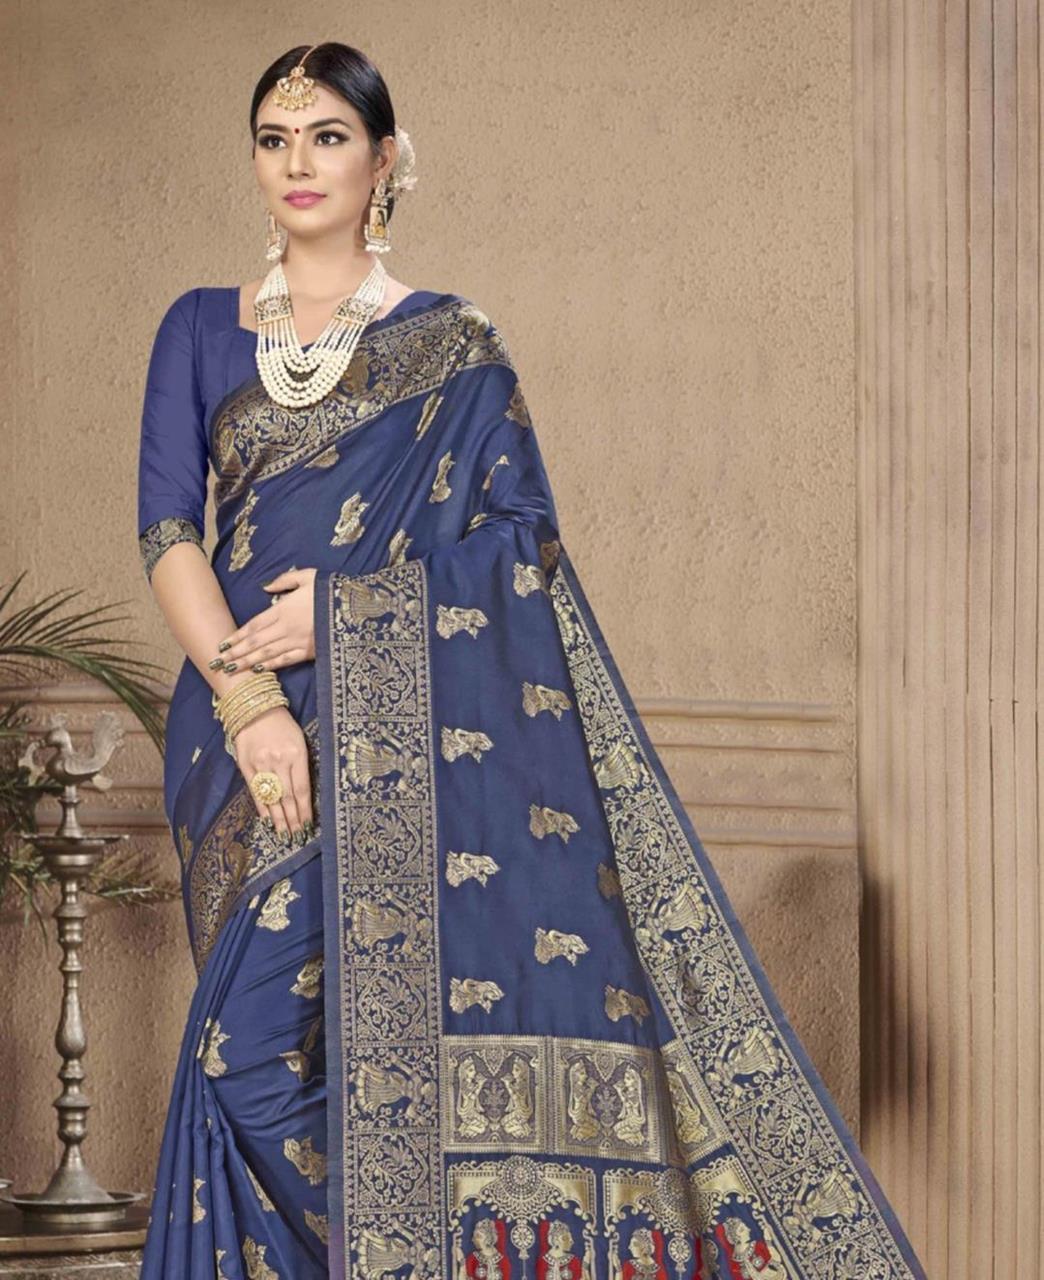 Woven Banarasi Silk Saree in Navyblue